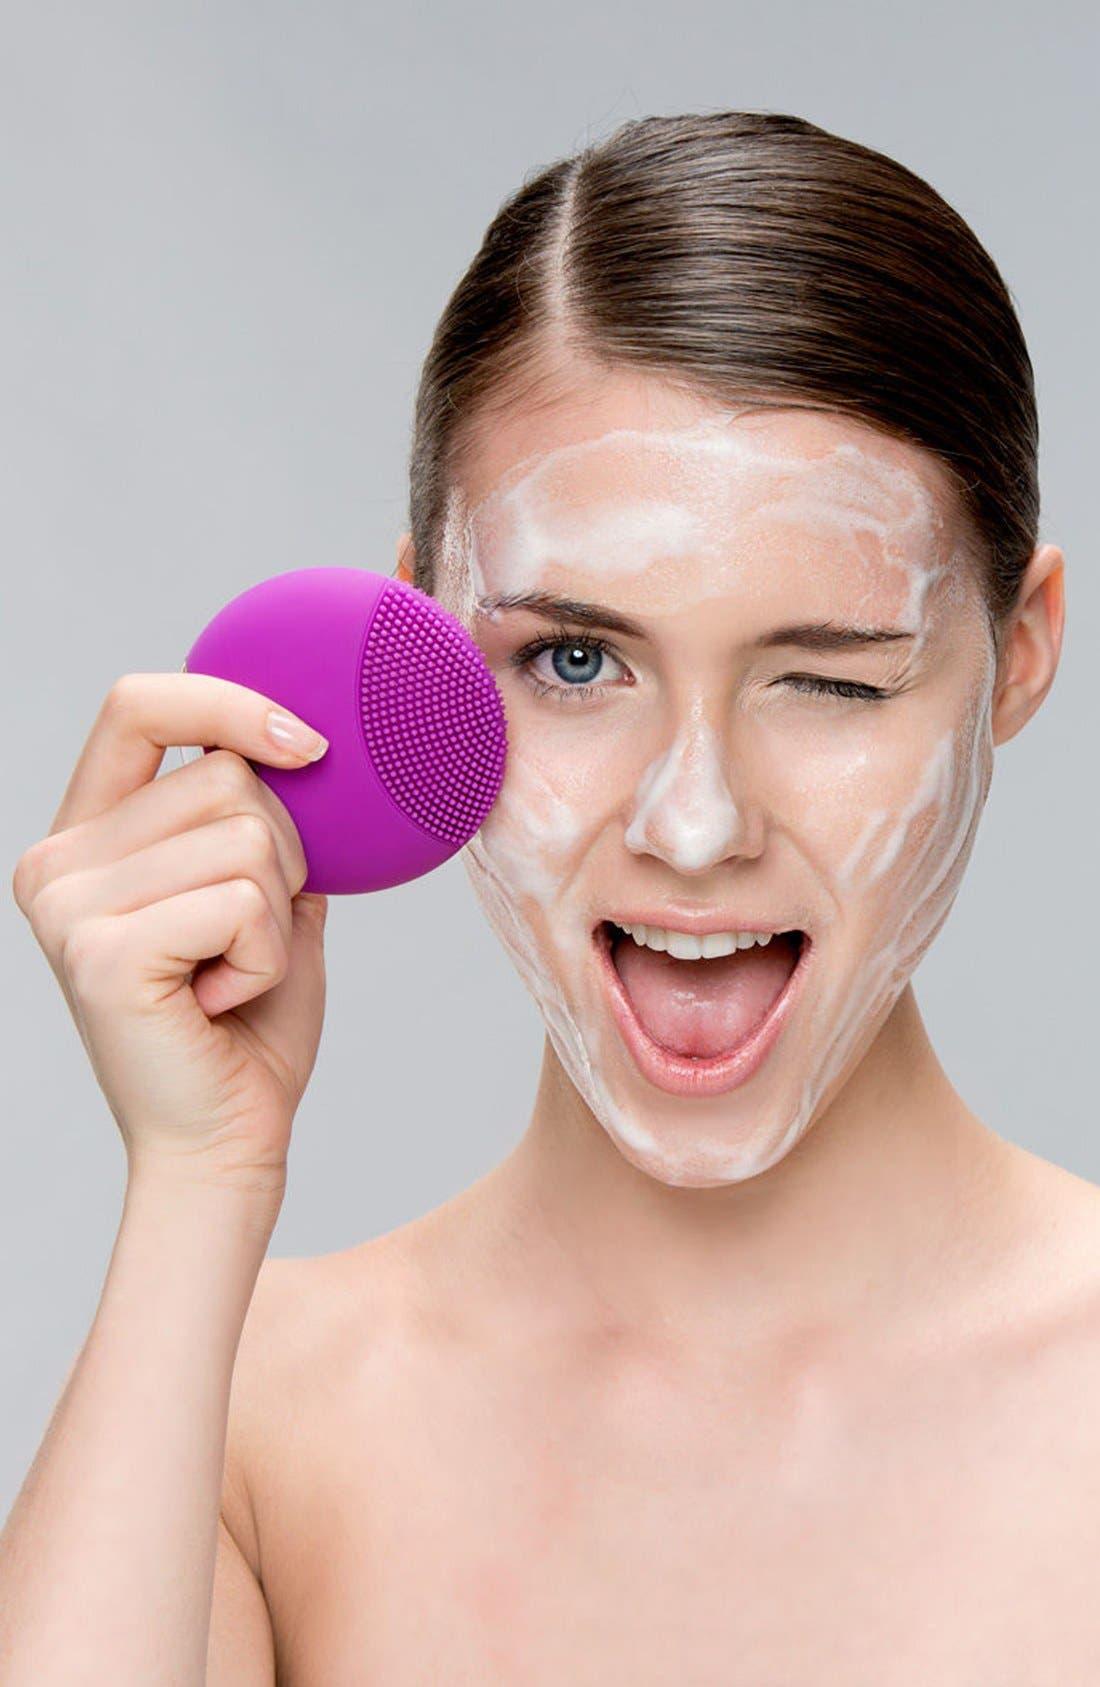 LUNA<sup>™</sup> mini Compact Facial Cleansing Device,                             Alternate thumbnail 5, color,                             PURPLE